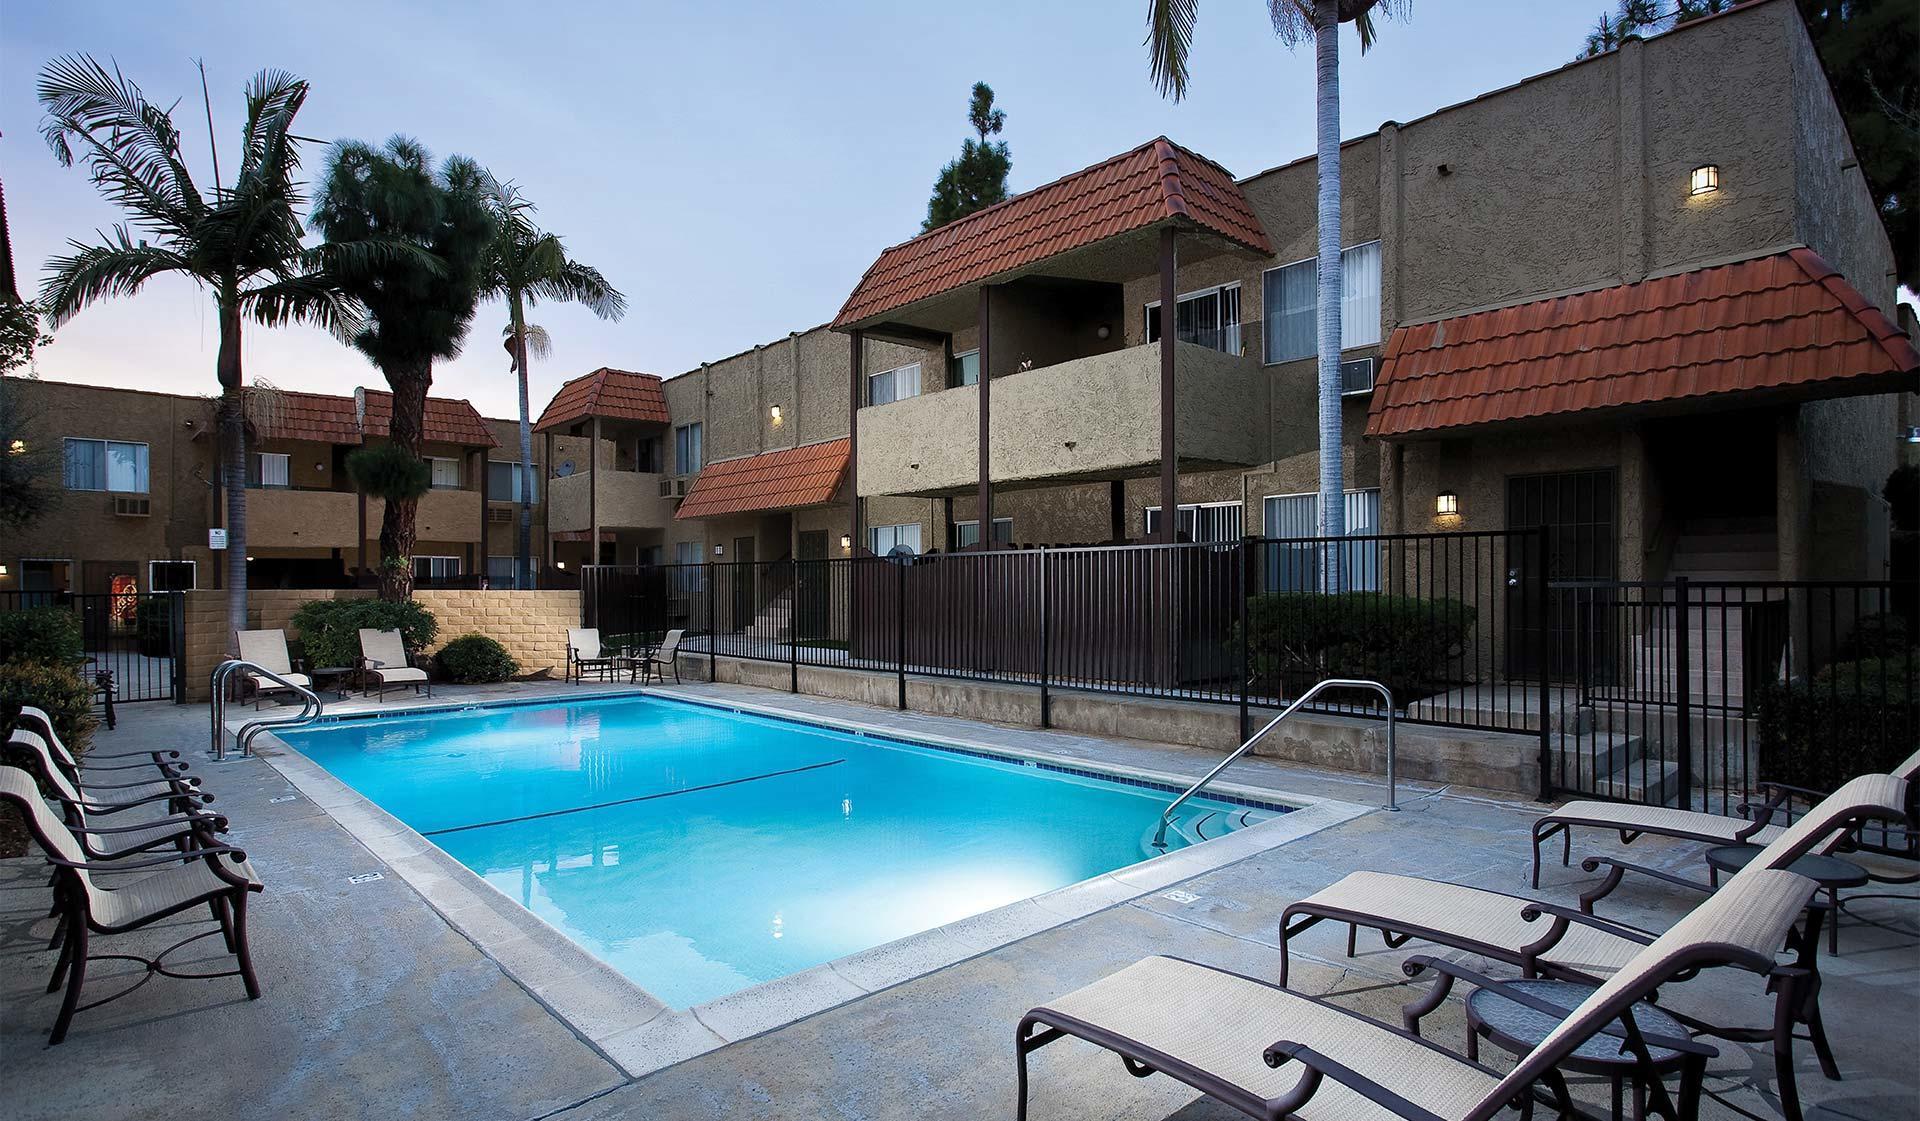 Villa del sol apartments in norwalk ca 90650 for Villas del sol